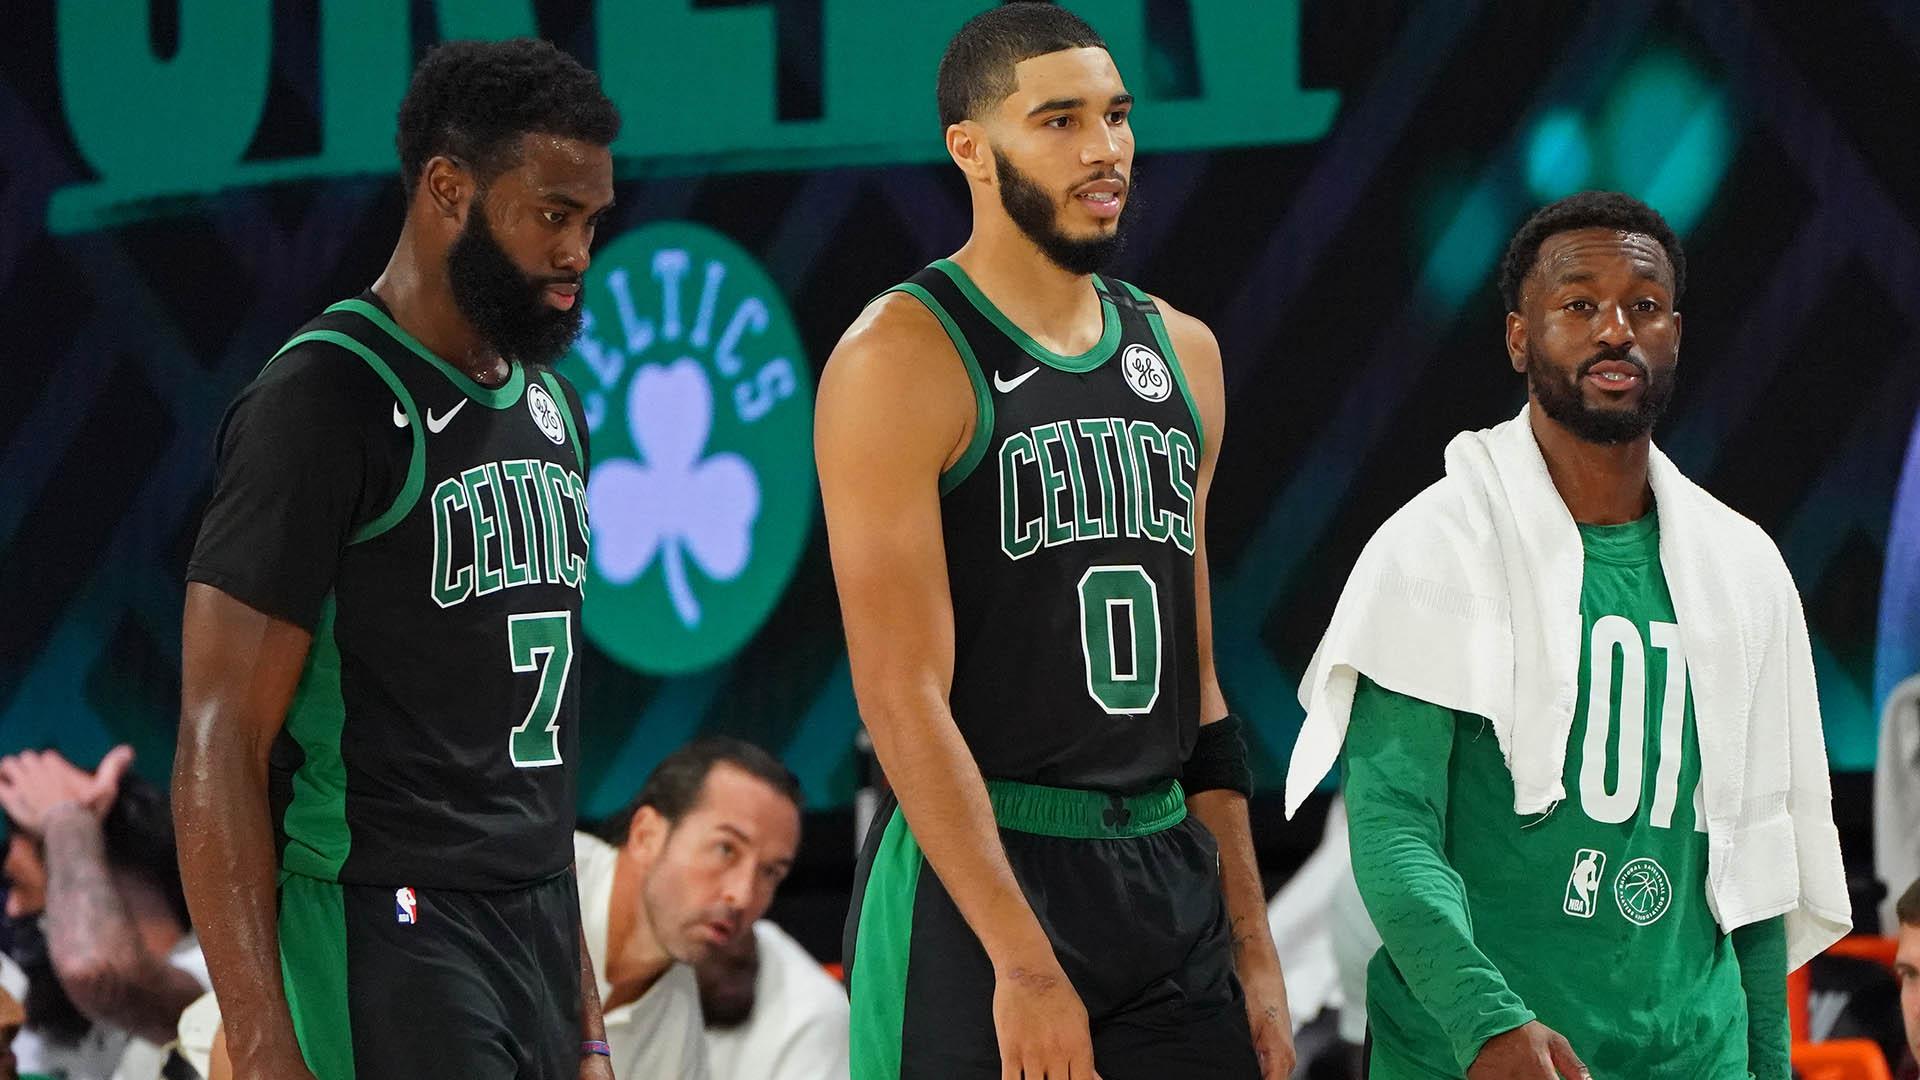 Celtics still waiting for their dynasty to begin